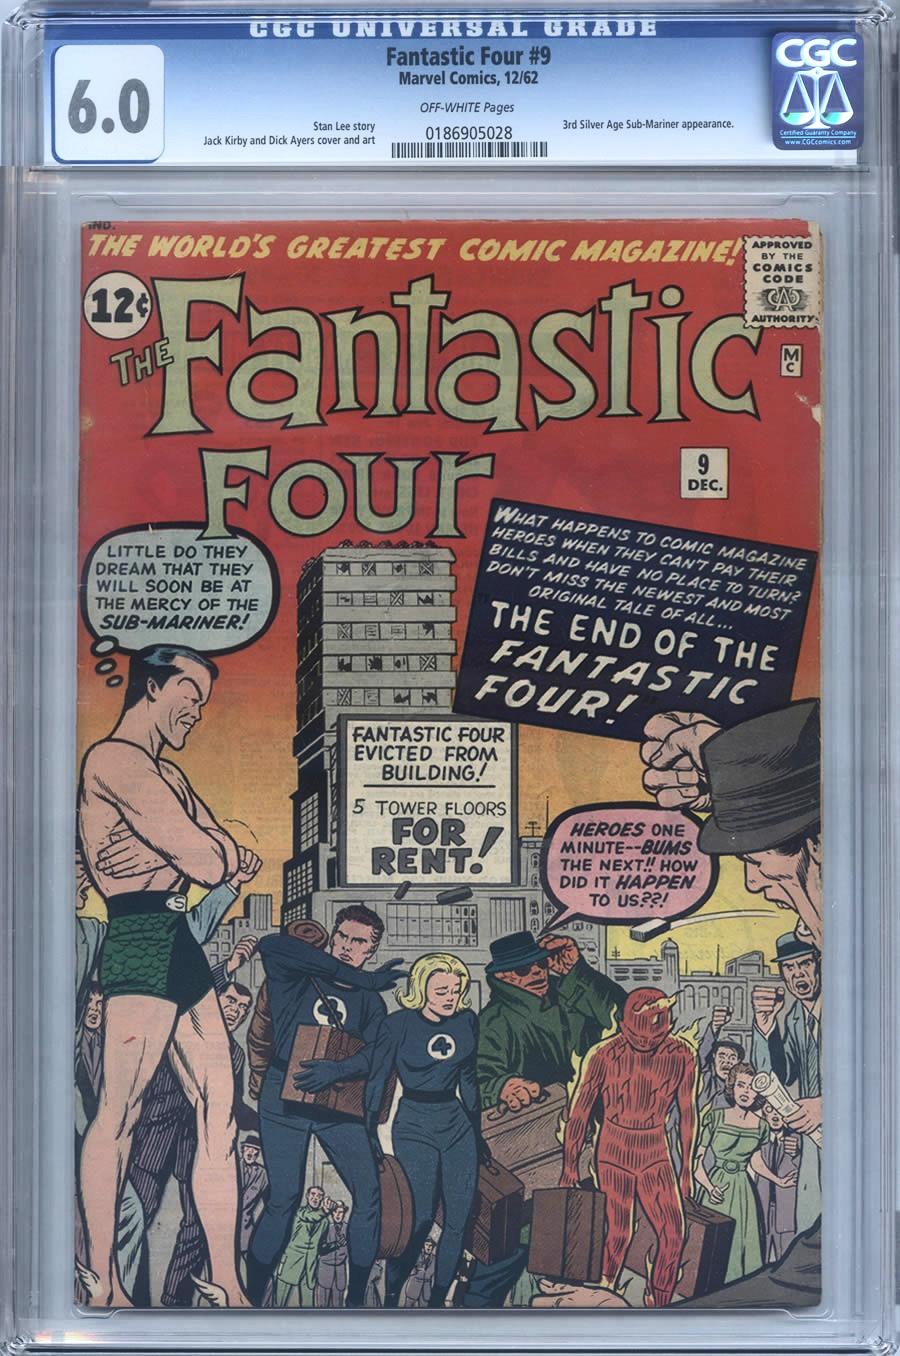 # 7 Very Fine vfn Valiant Modern Age Comics vol 1 Learned Archer & Armstrong